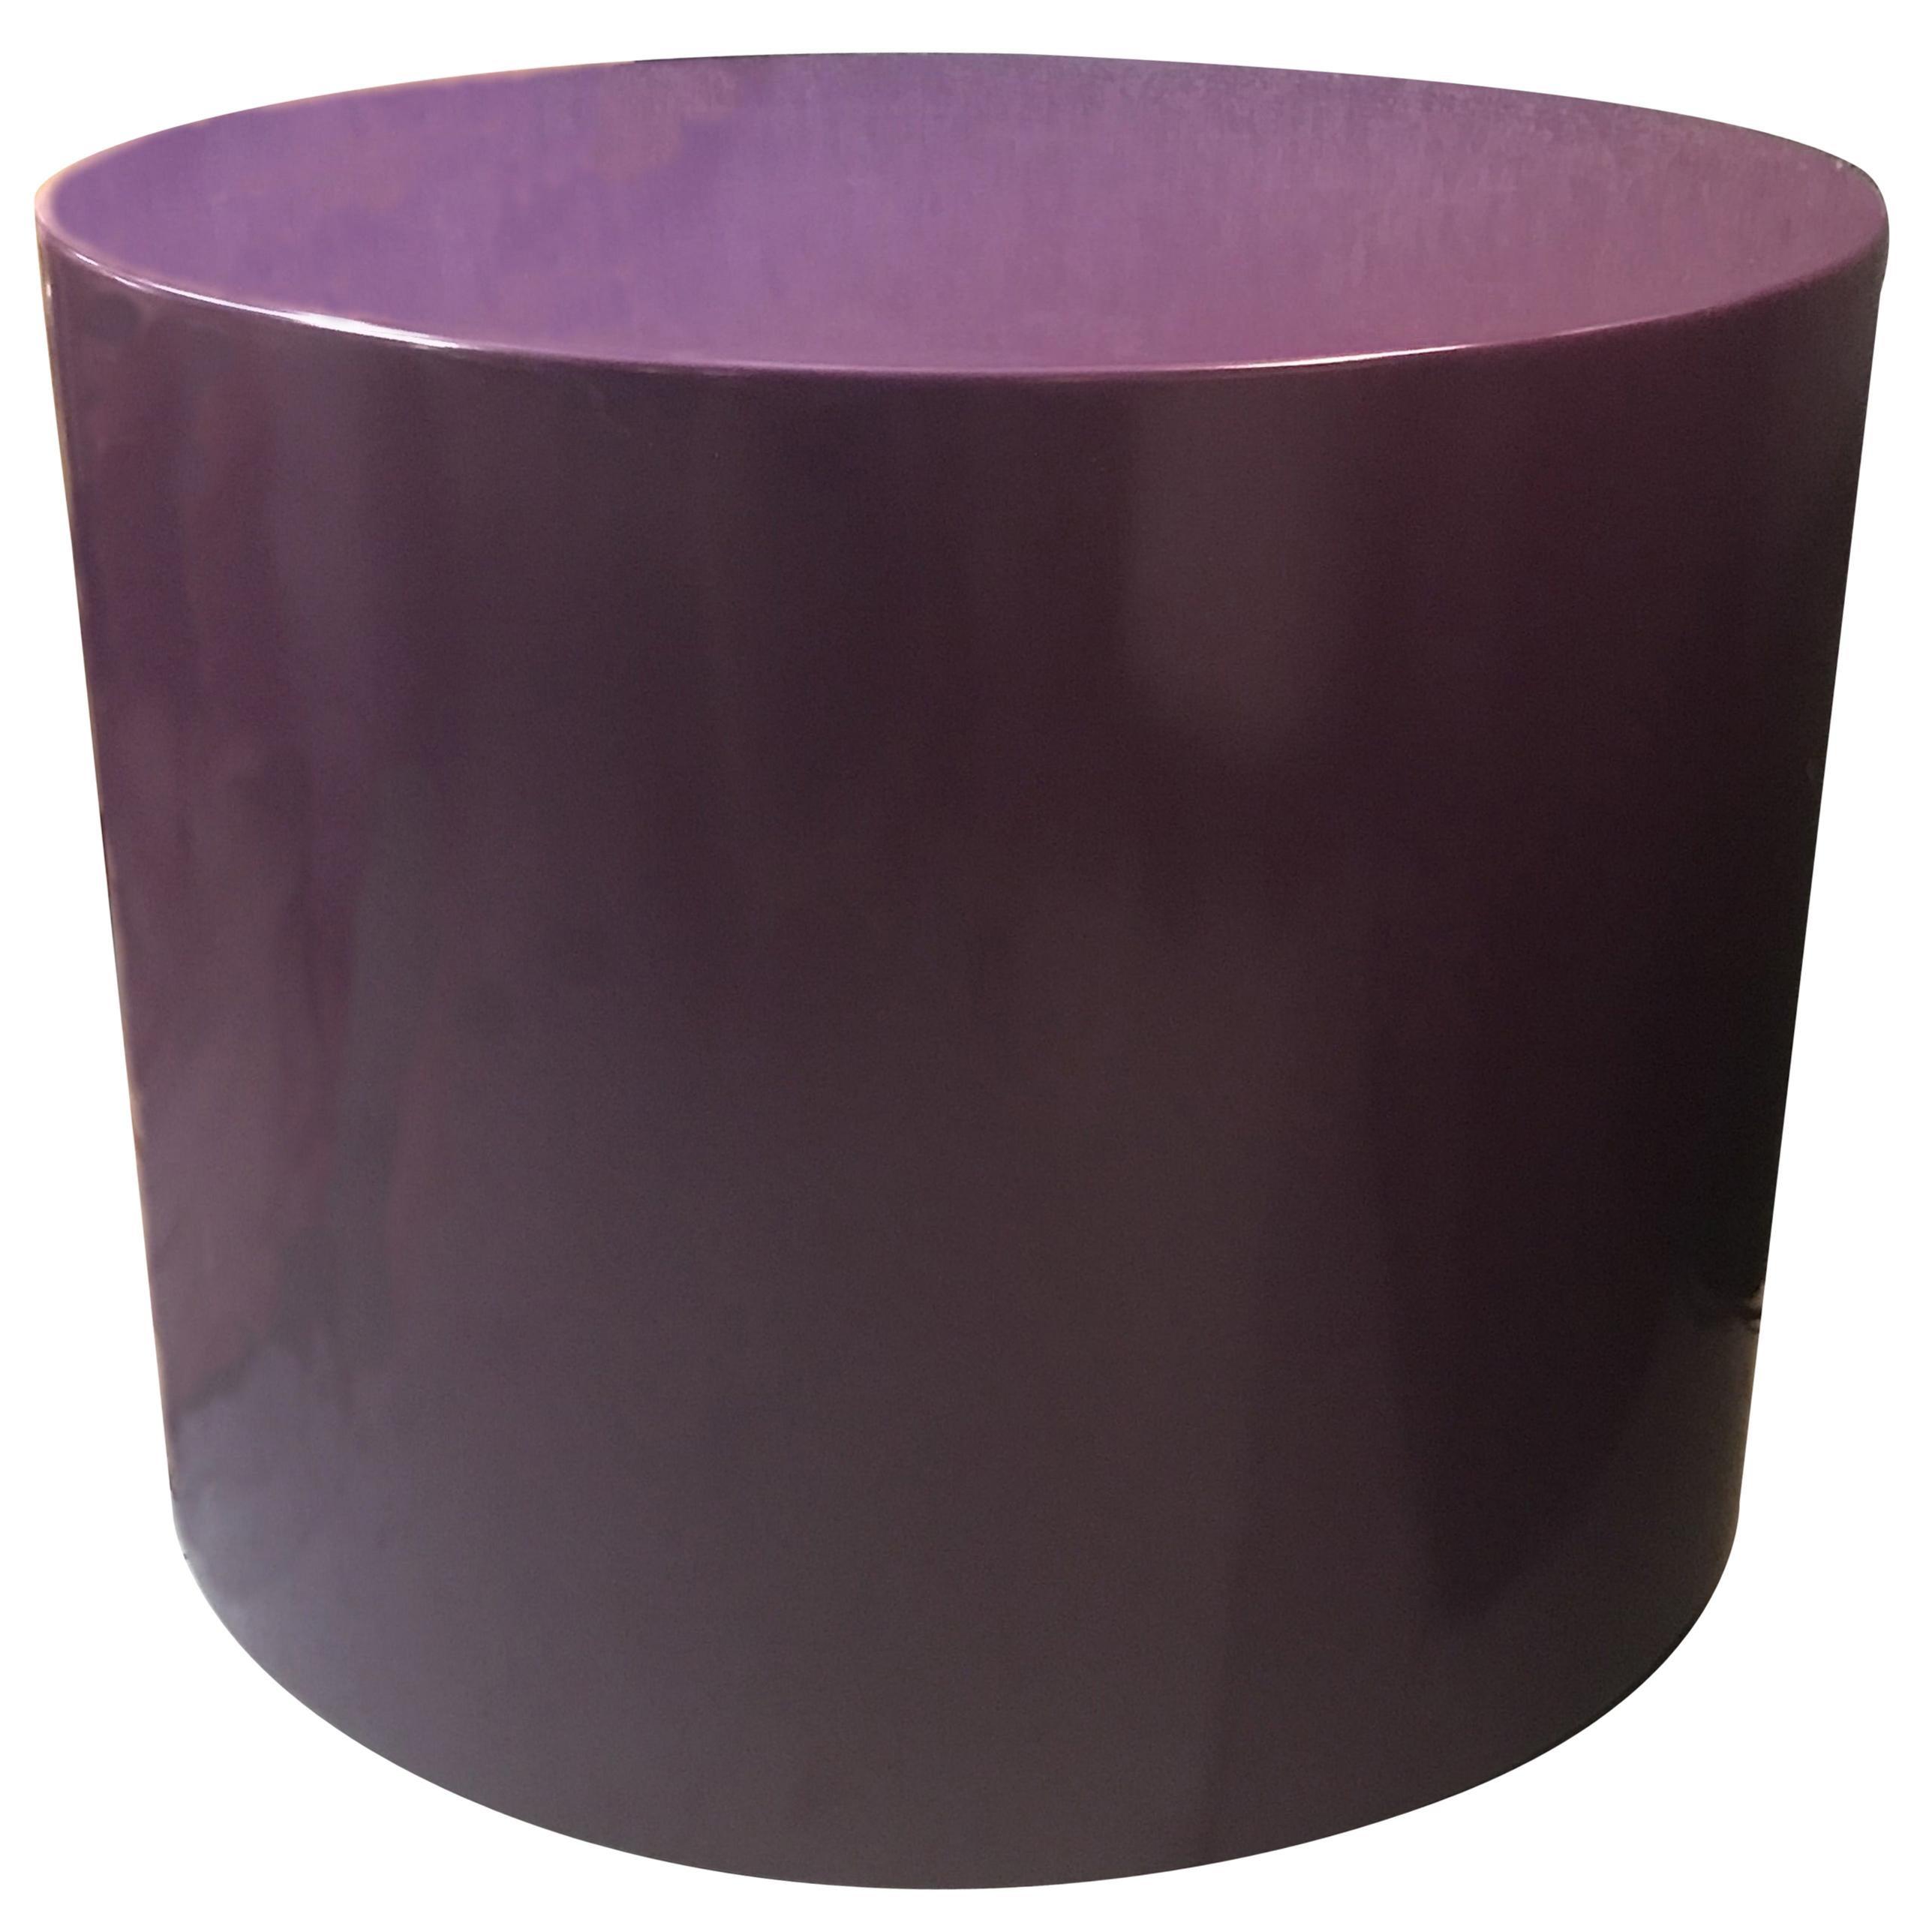 Memphis Purple Lacquer Swivel Pedestal or Side Table